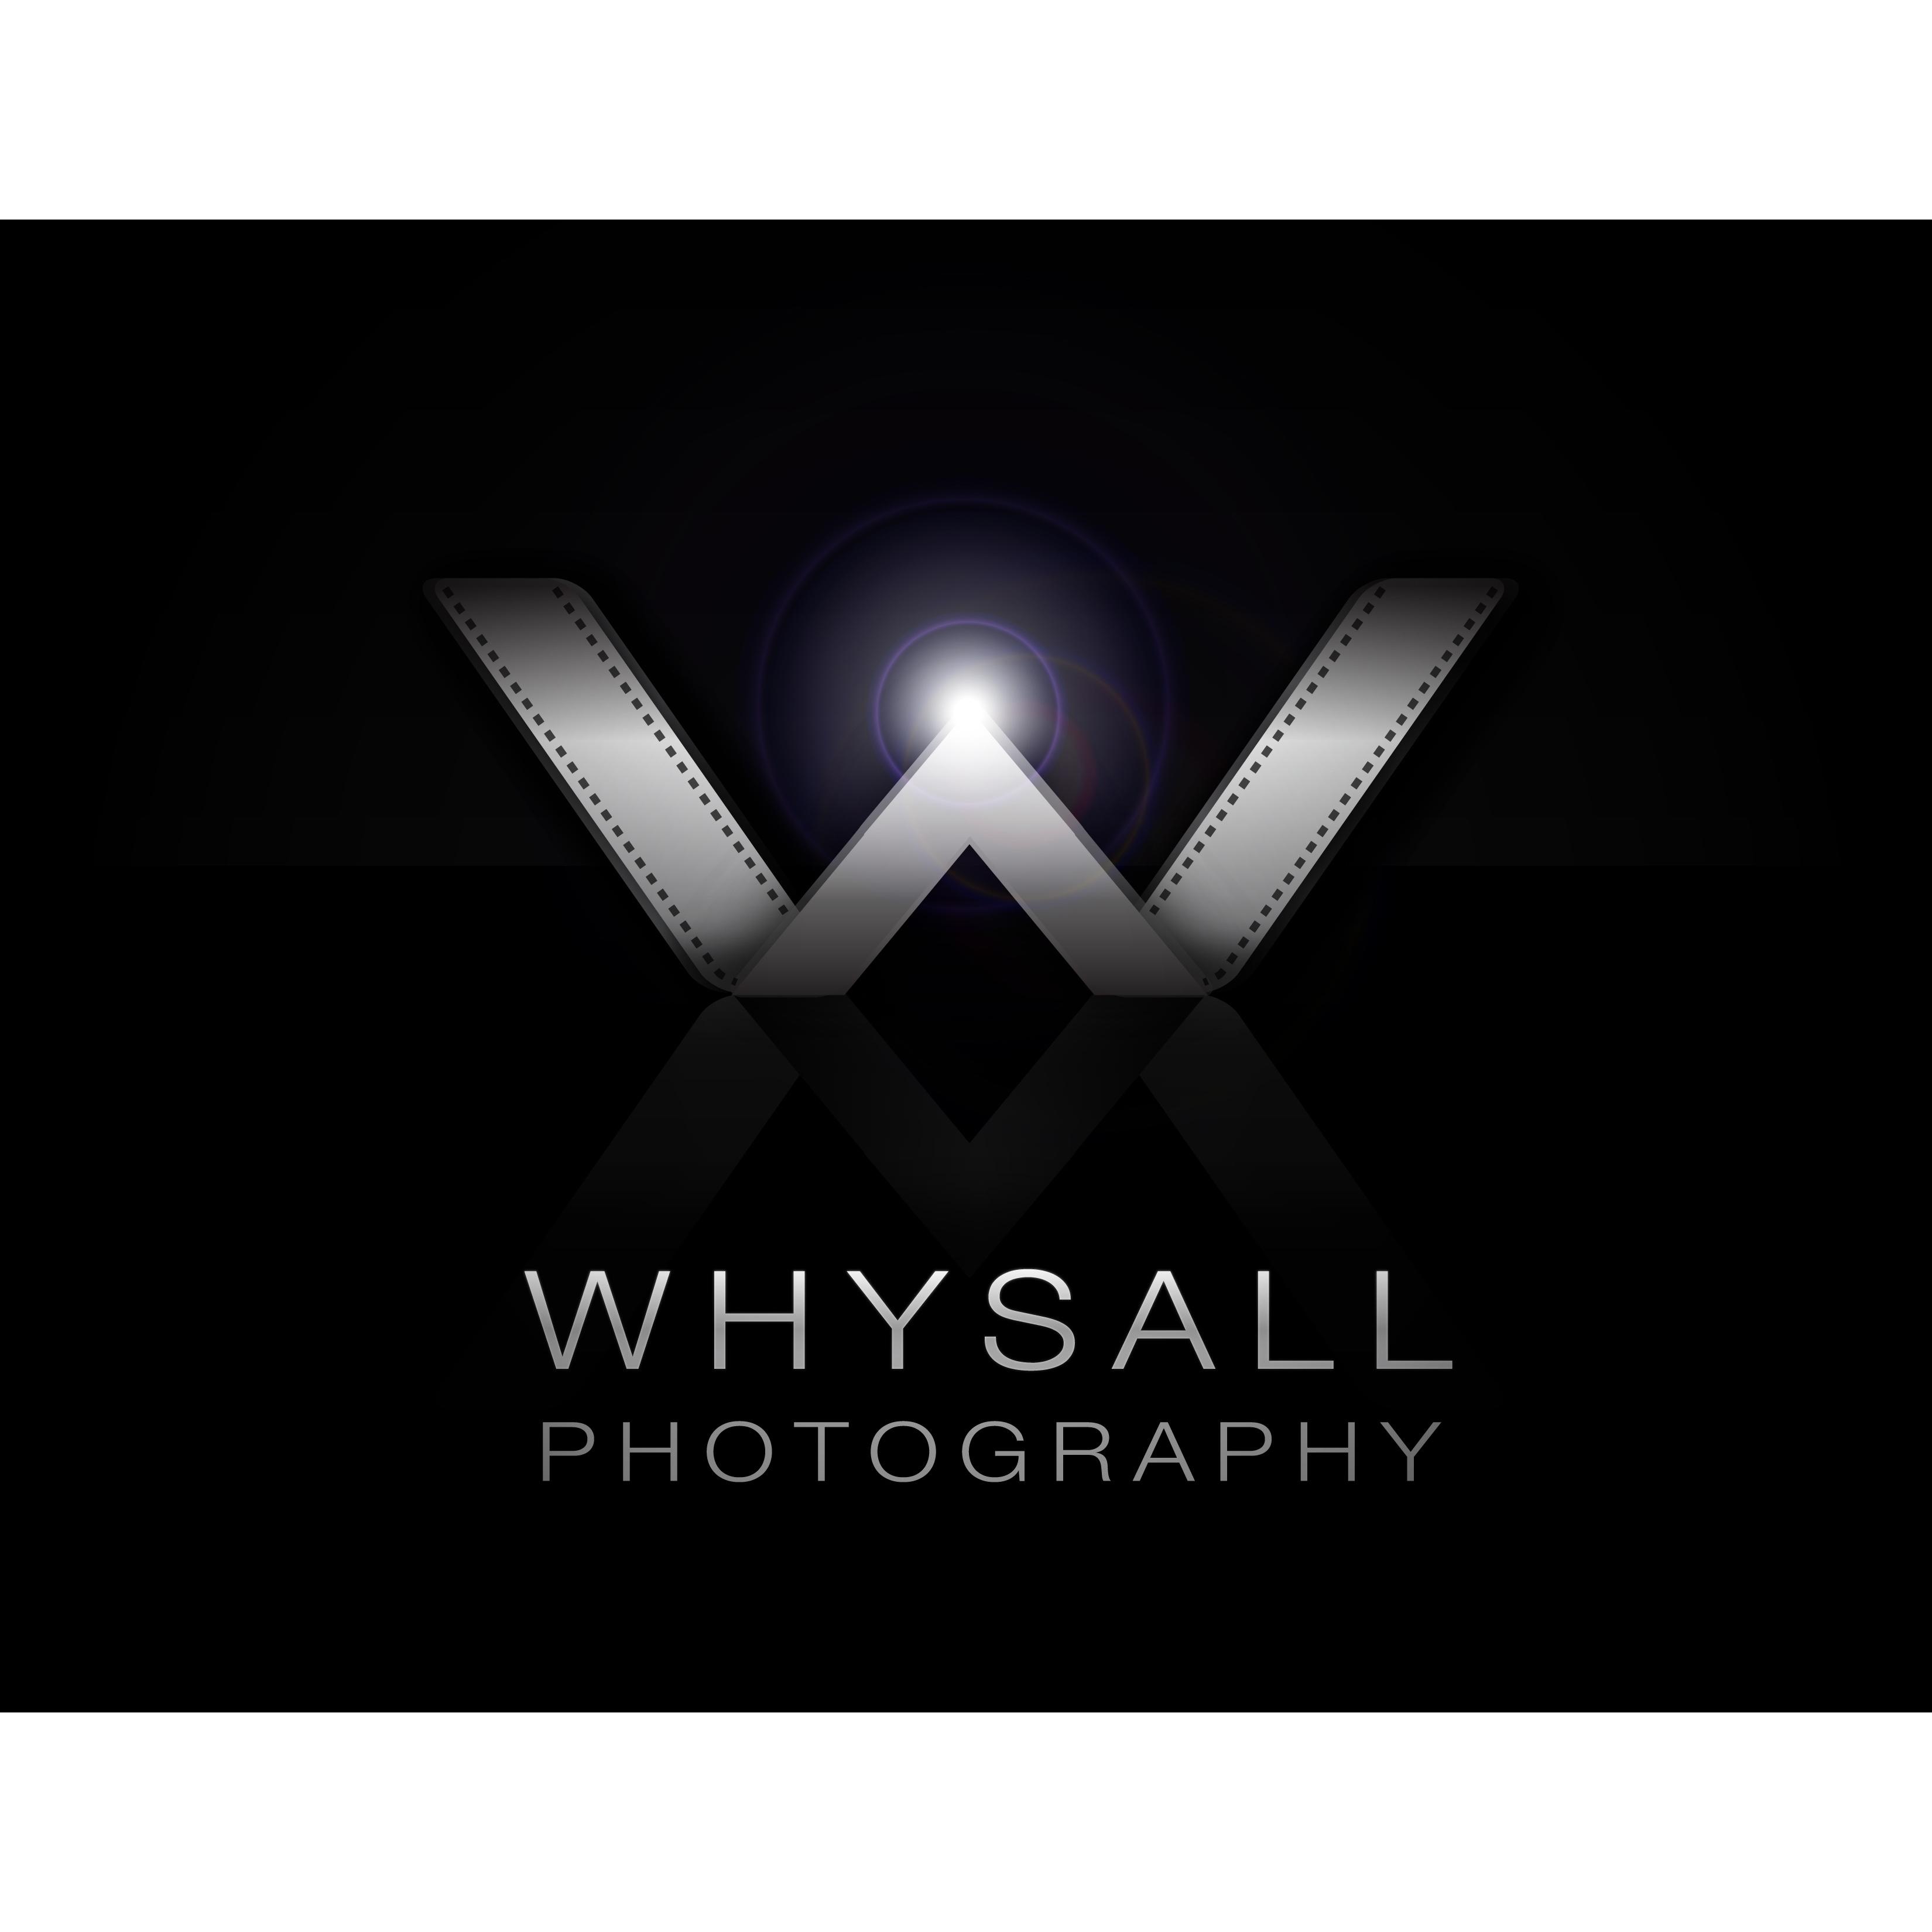 Whysall Photography, LLC